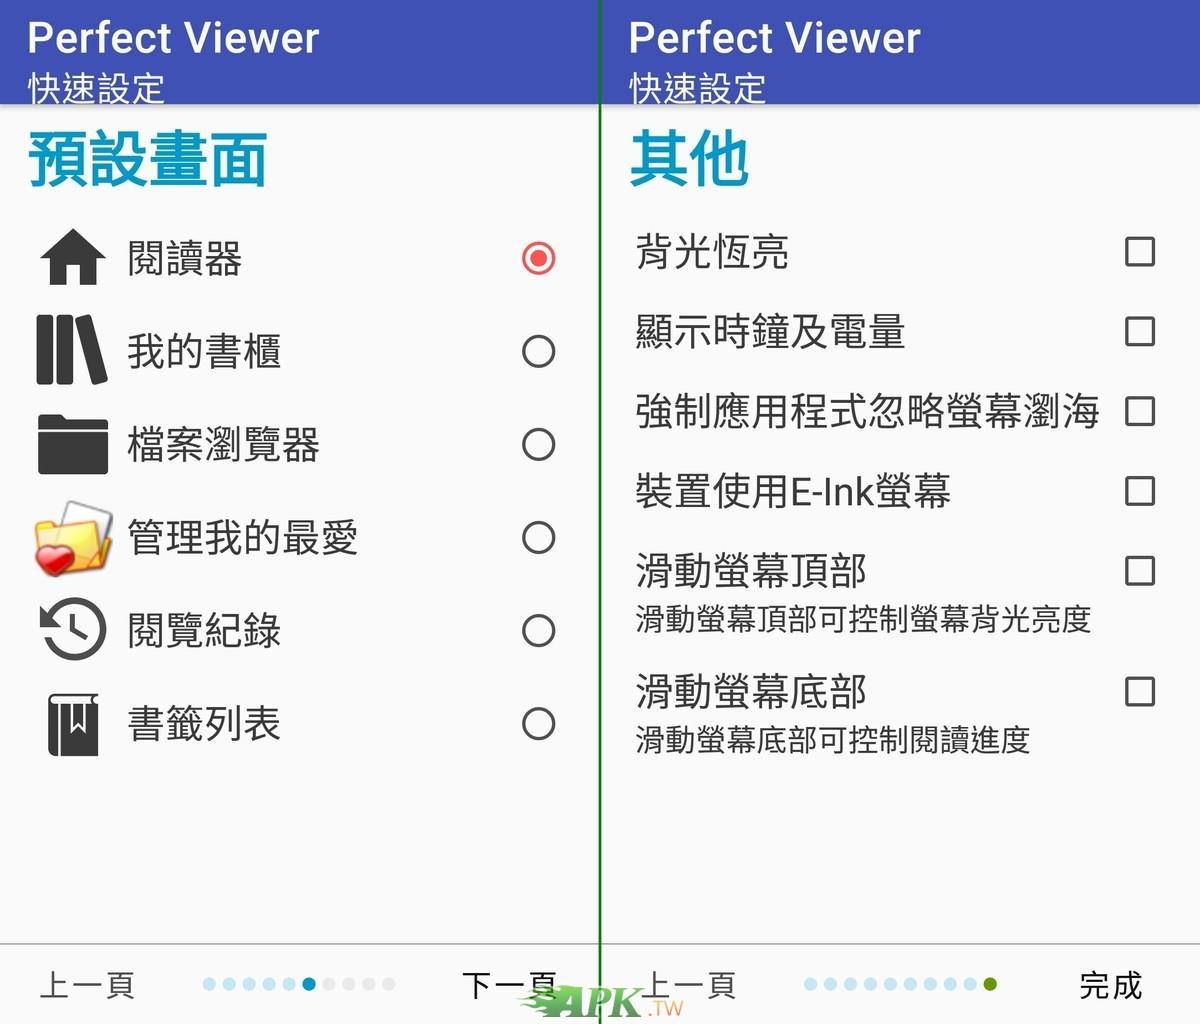 PerfectViewer__2.jpg